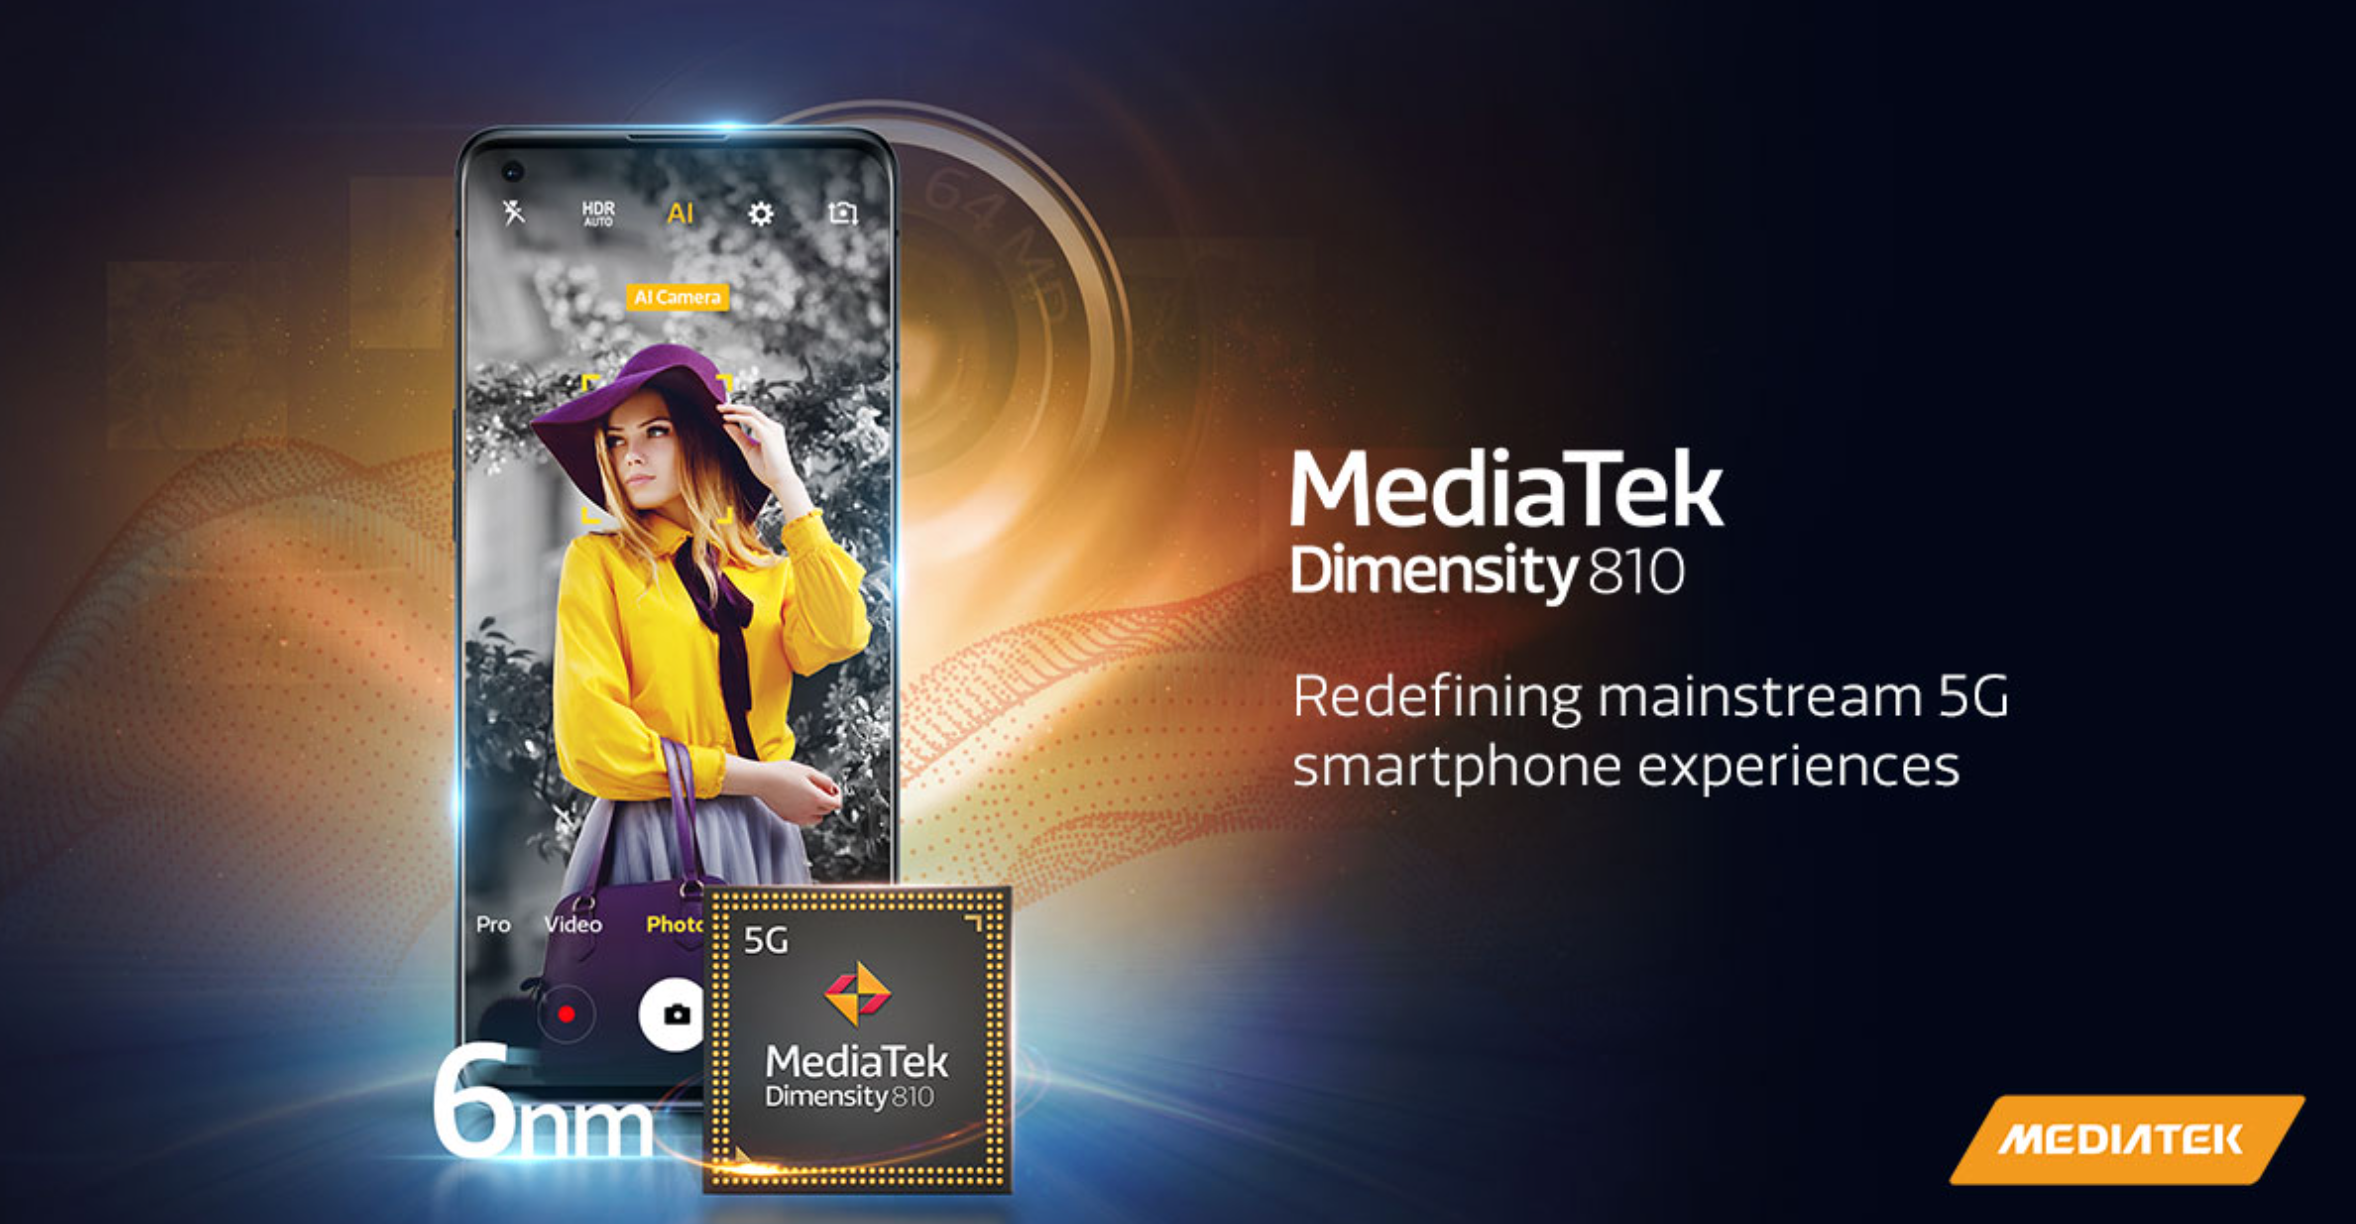 Realme blir först ut med en smartphone med MediaTeks Dimensity 810